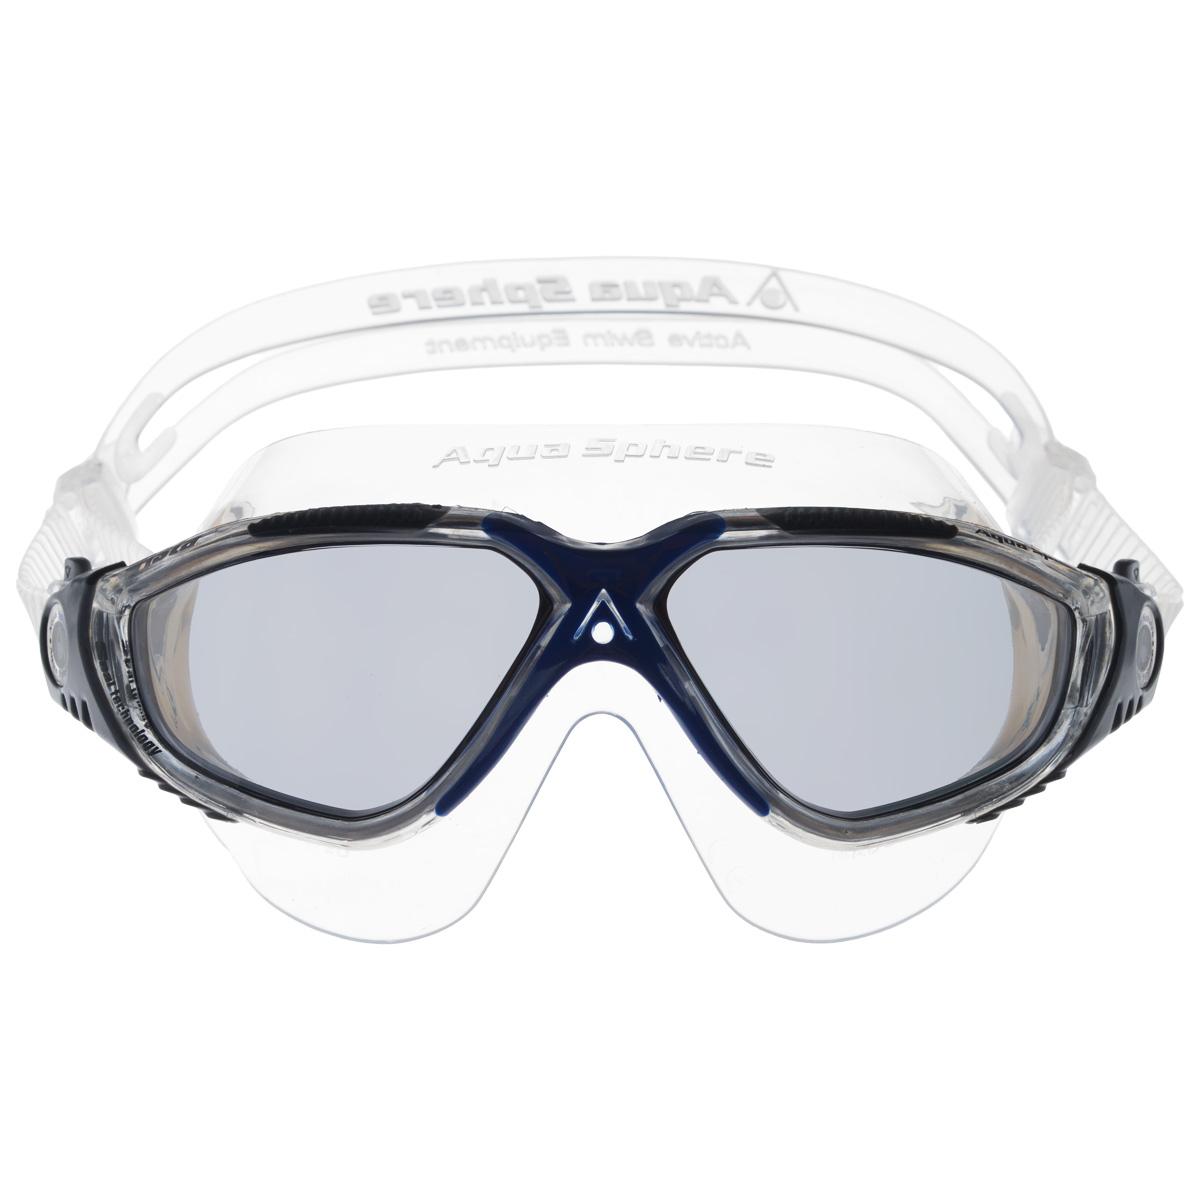 все цены на Очки для плавания Aqua Sphere